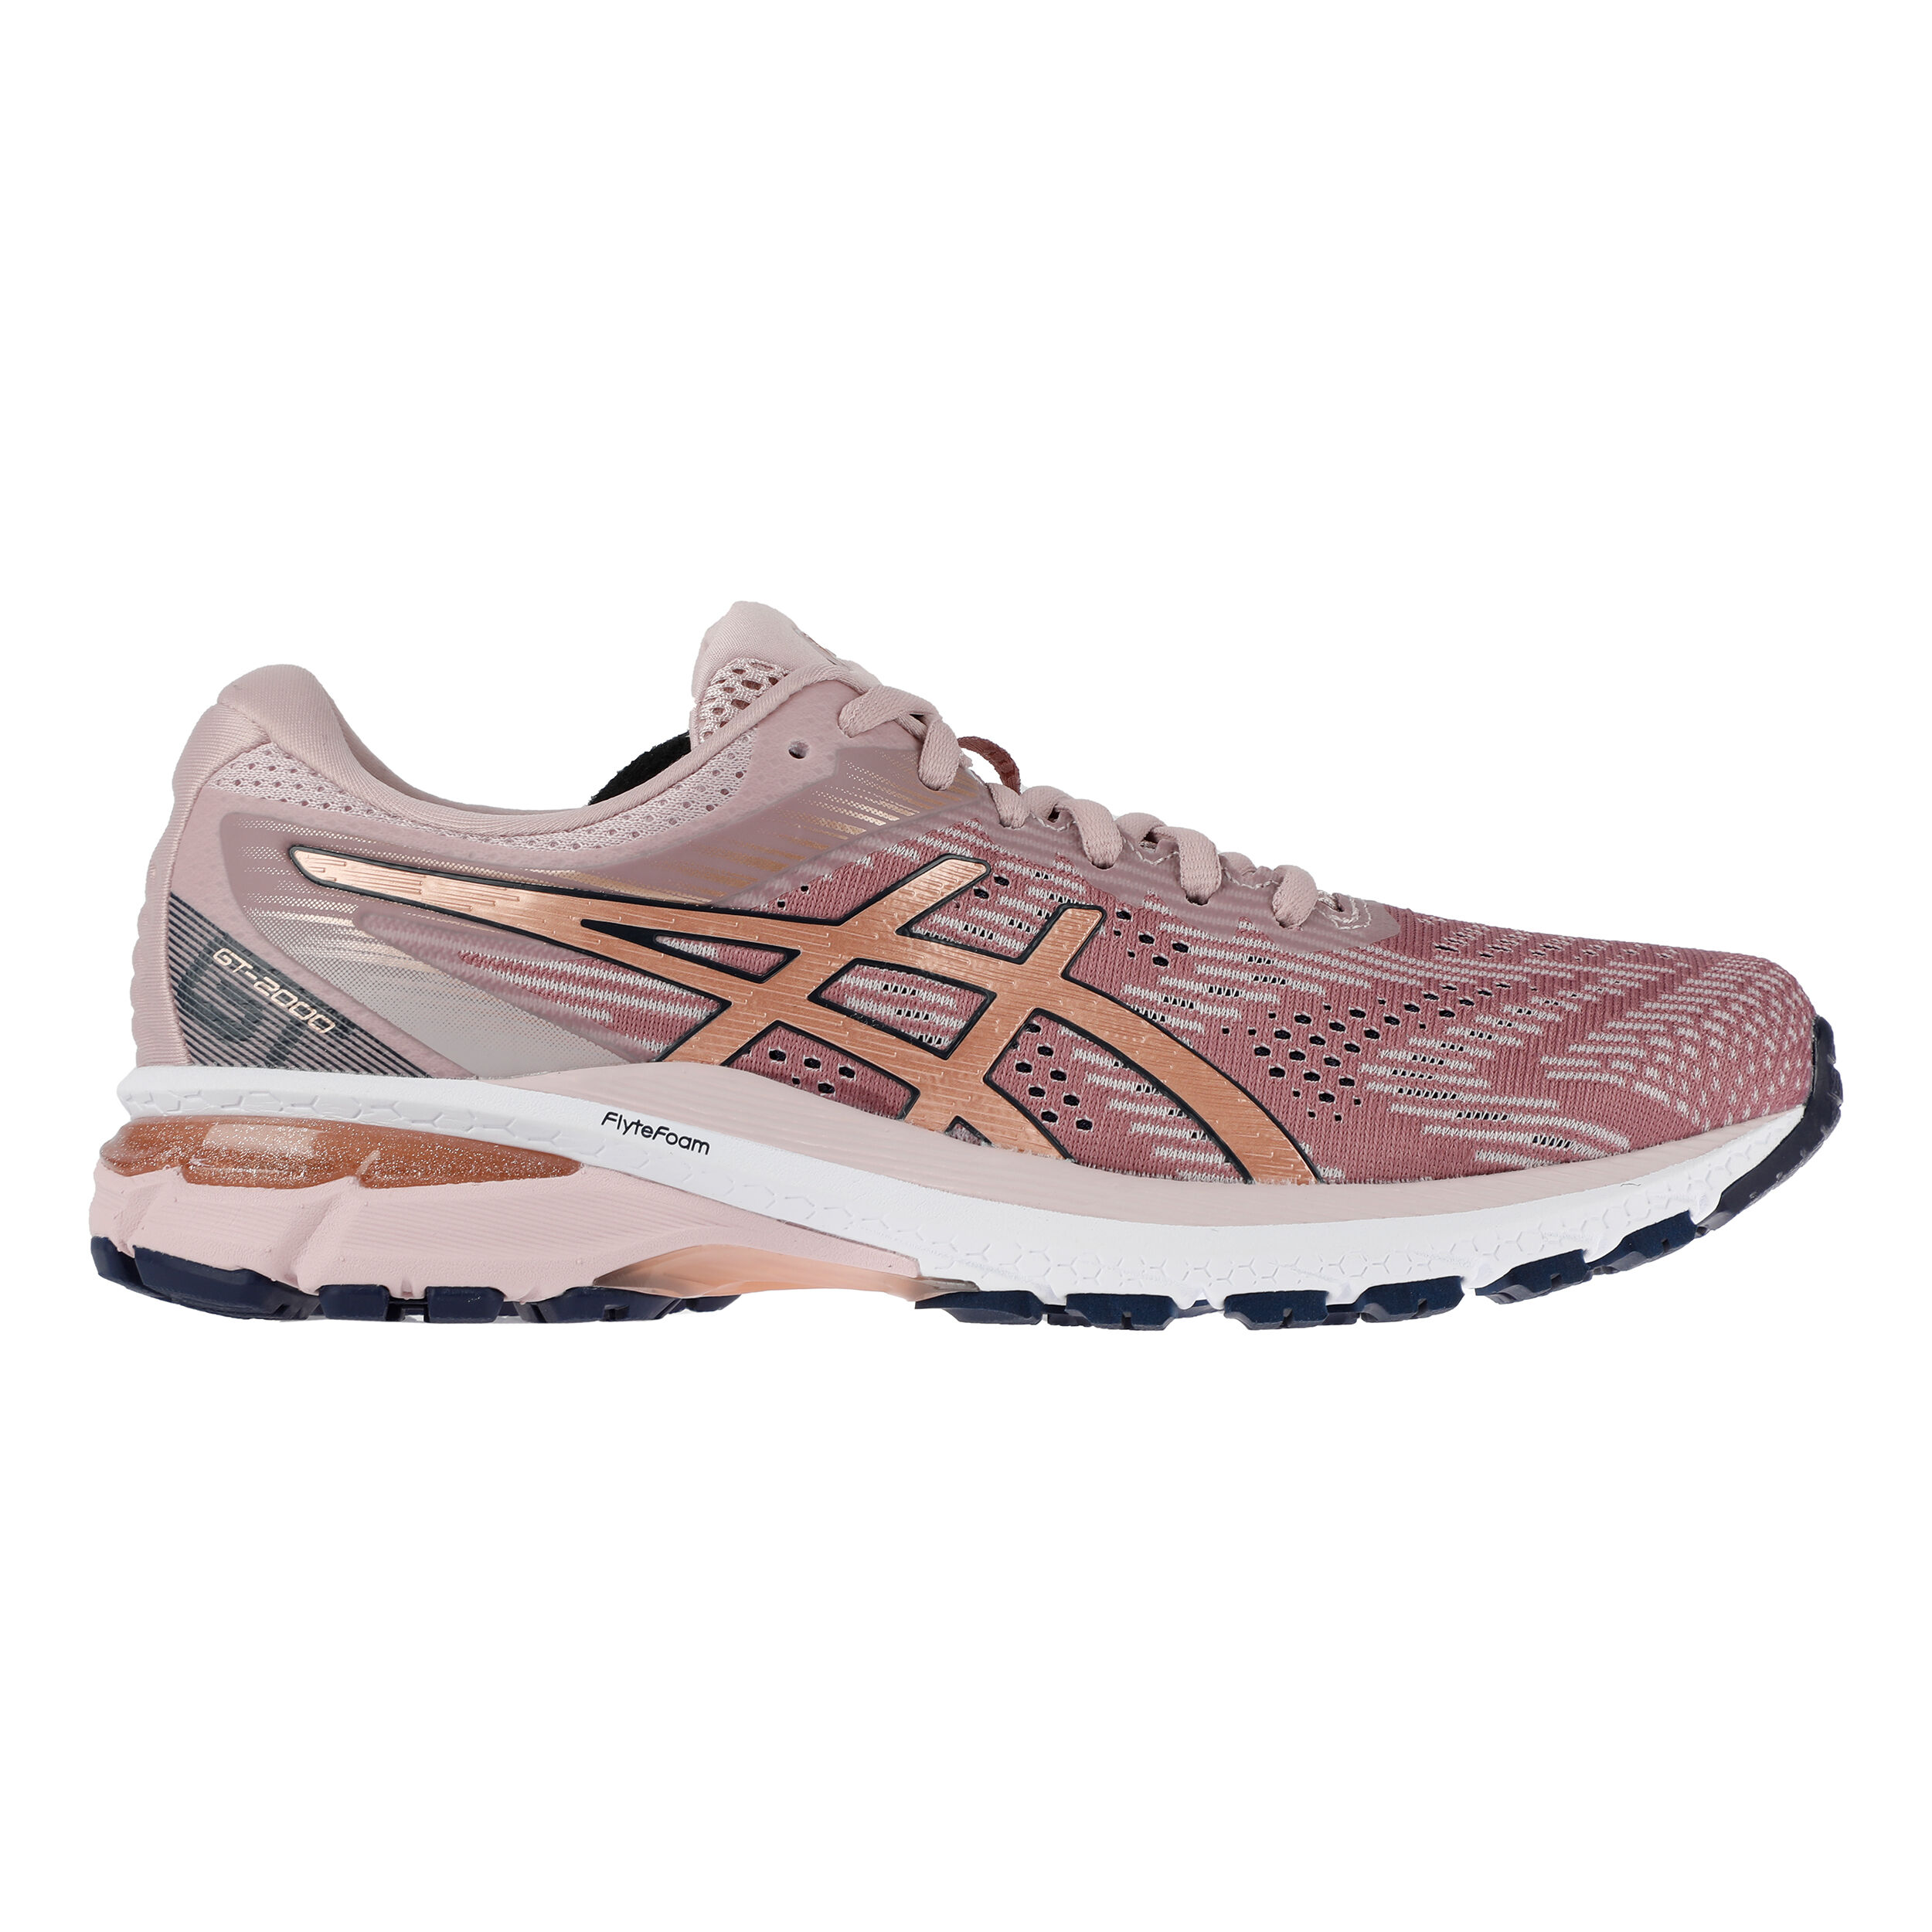 Asics GT-2000 8 Stability Running Shoe Women - Pink, Ecru